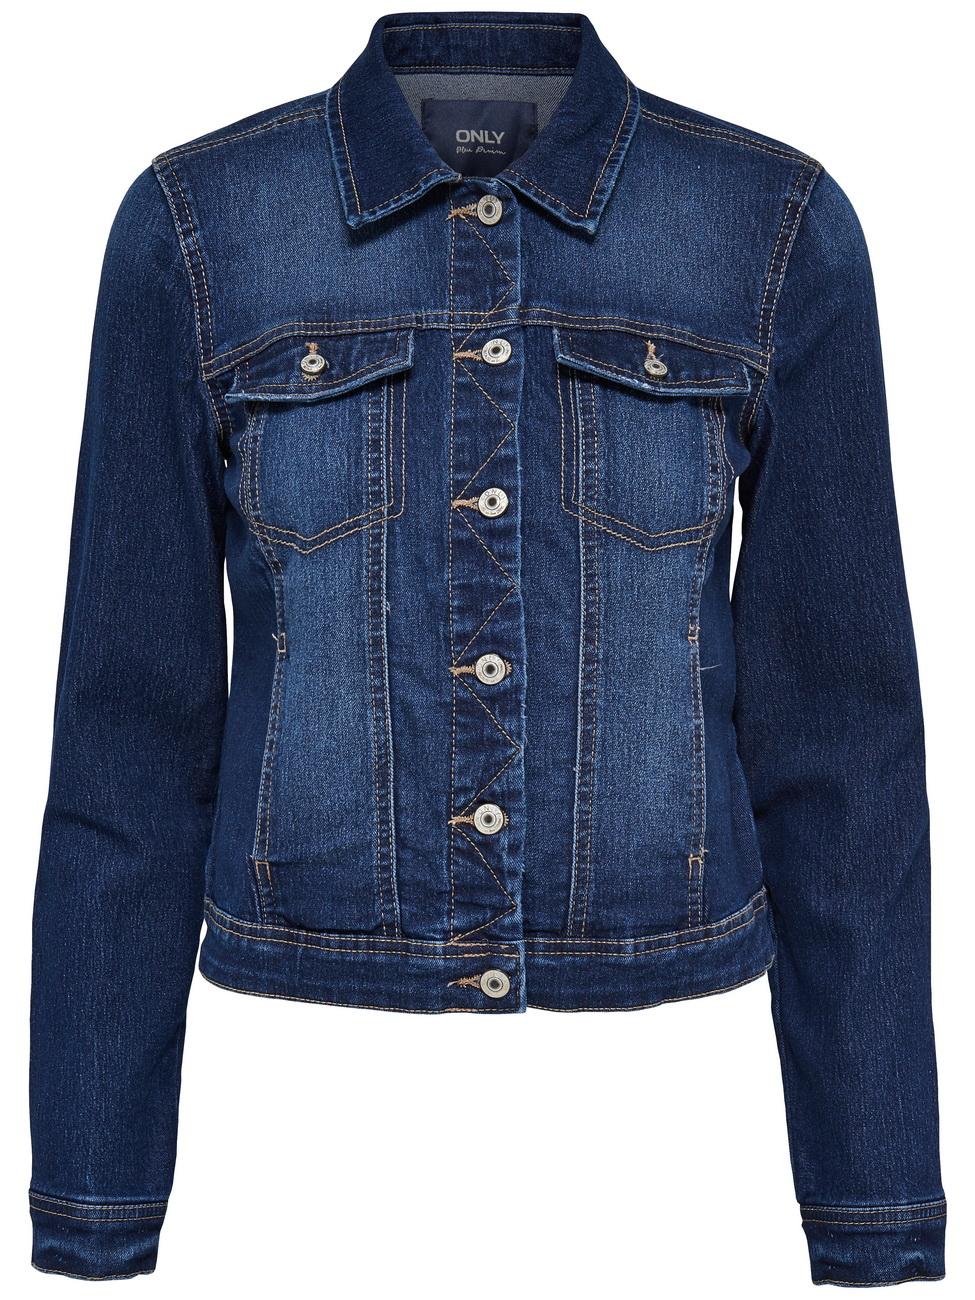 only damen jeansjacke onlwesta dnm jacket pimf1702 kaufen. Black Bedroom Furniture Sets. Home Design Ideas